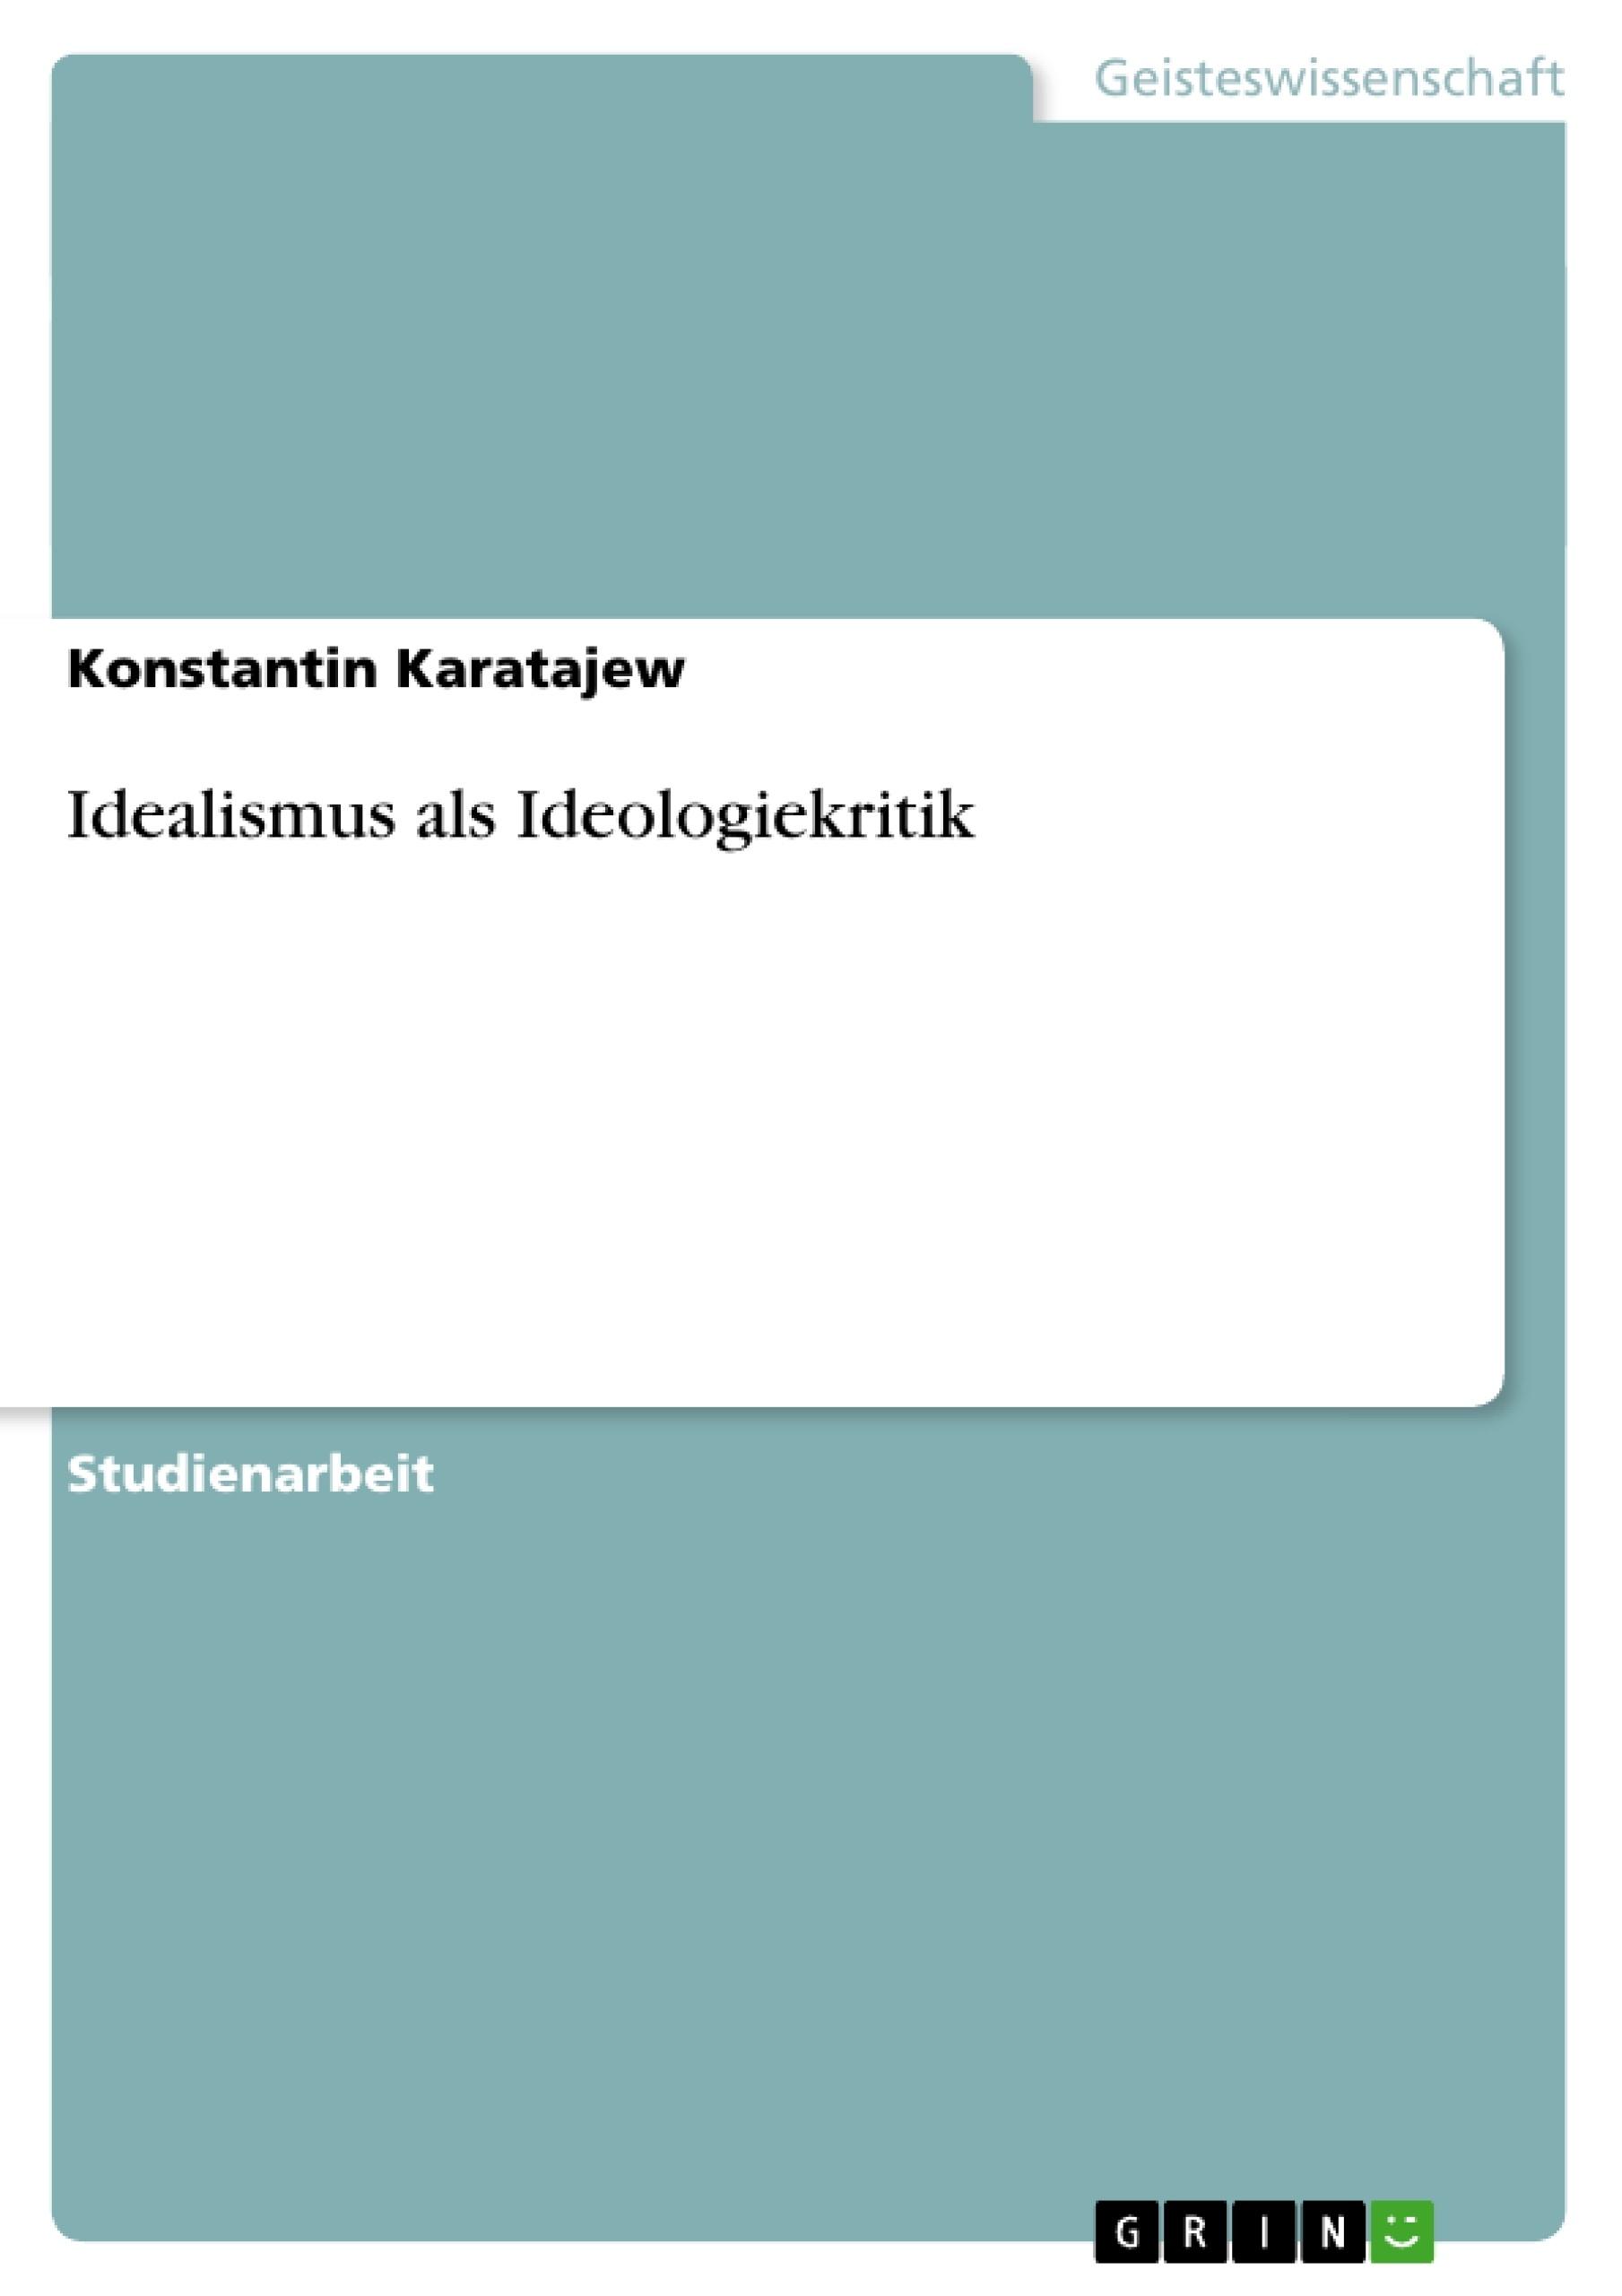 Titel: Idealismus als Ideologiekritik